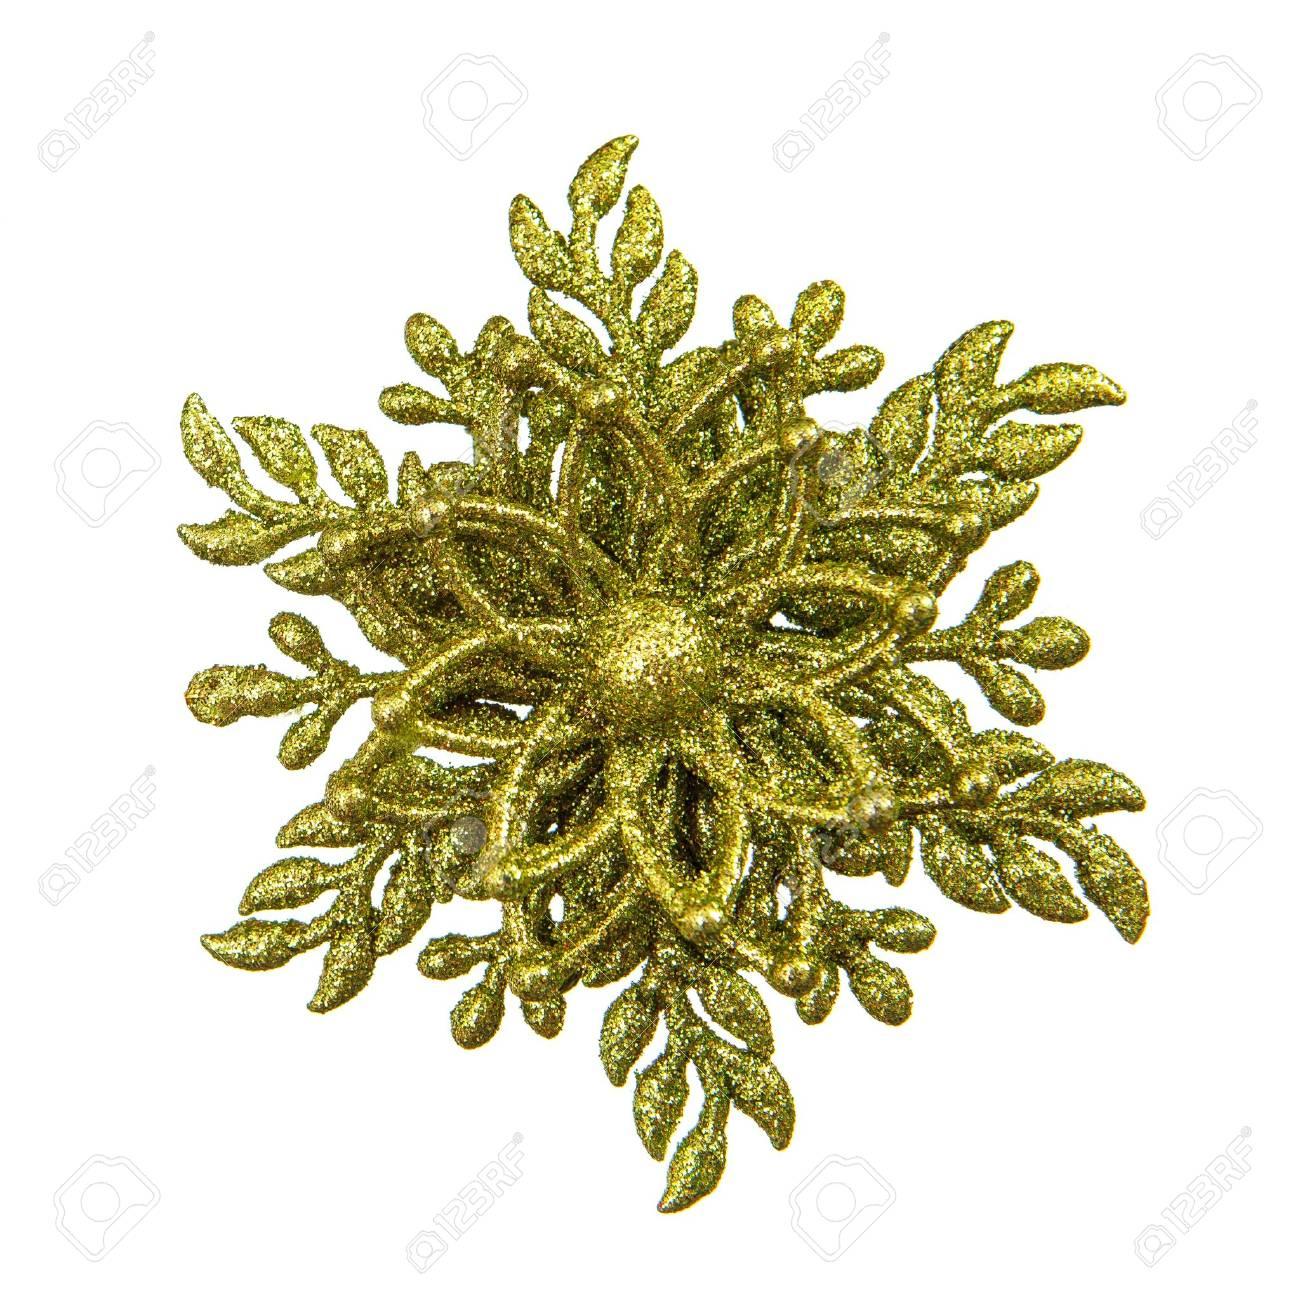 Christmas decoration star isolated on white background Stock Photo - 16262015